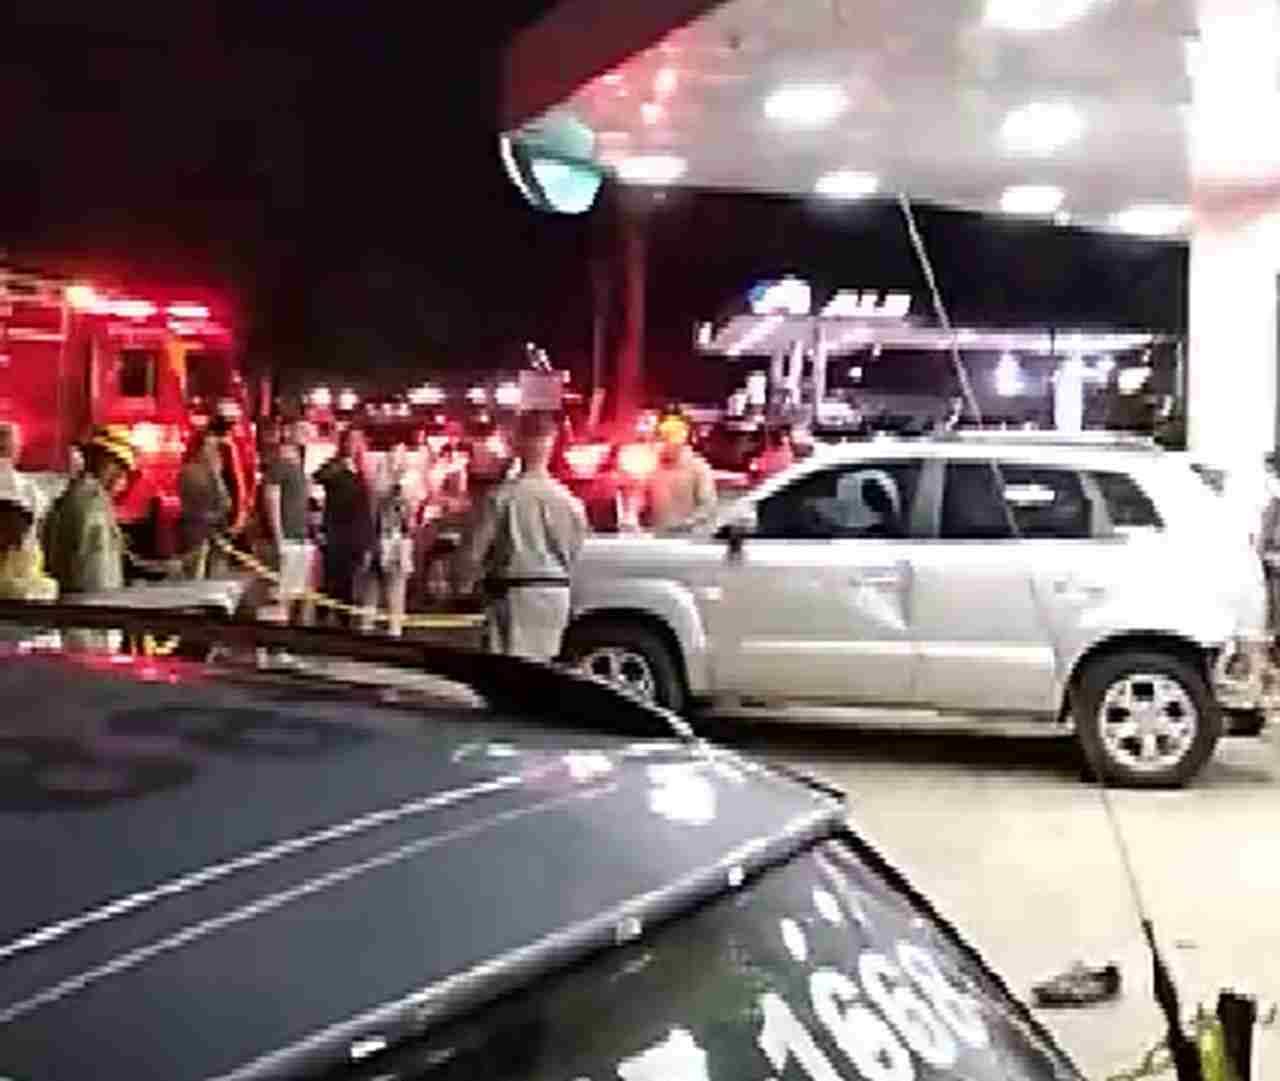 Homem arremessado morreu batida Anápolis